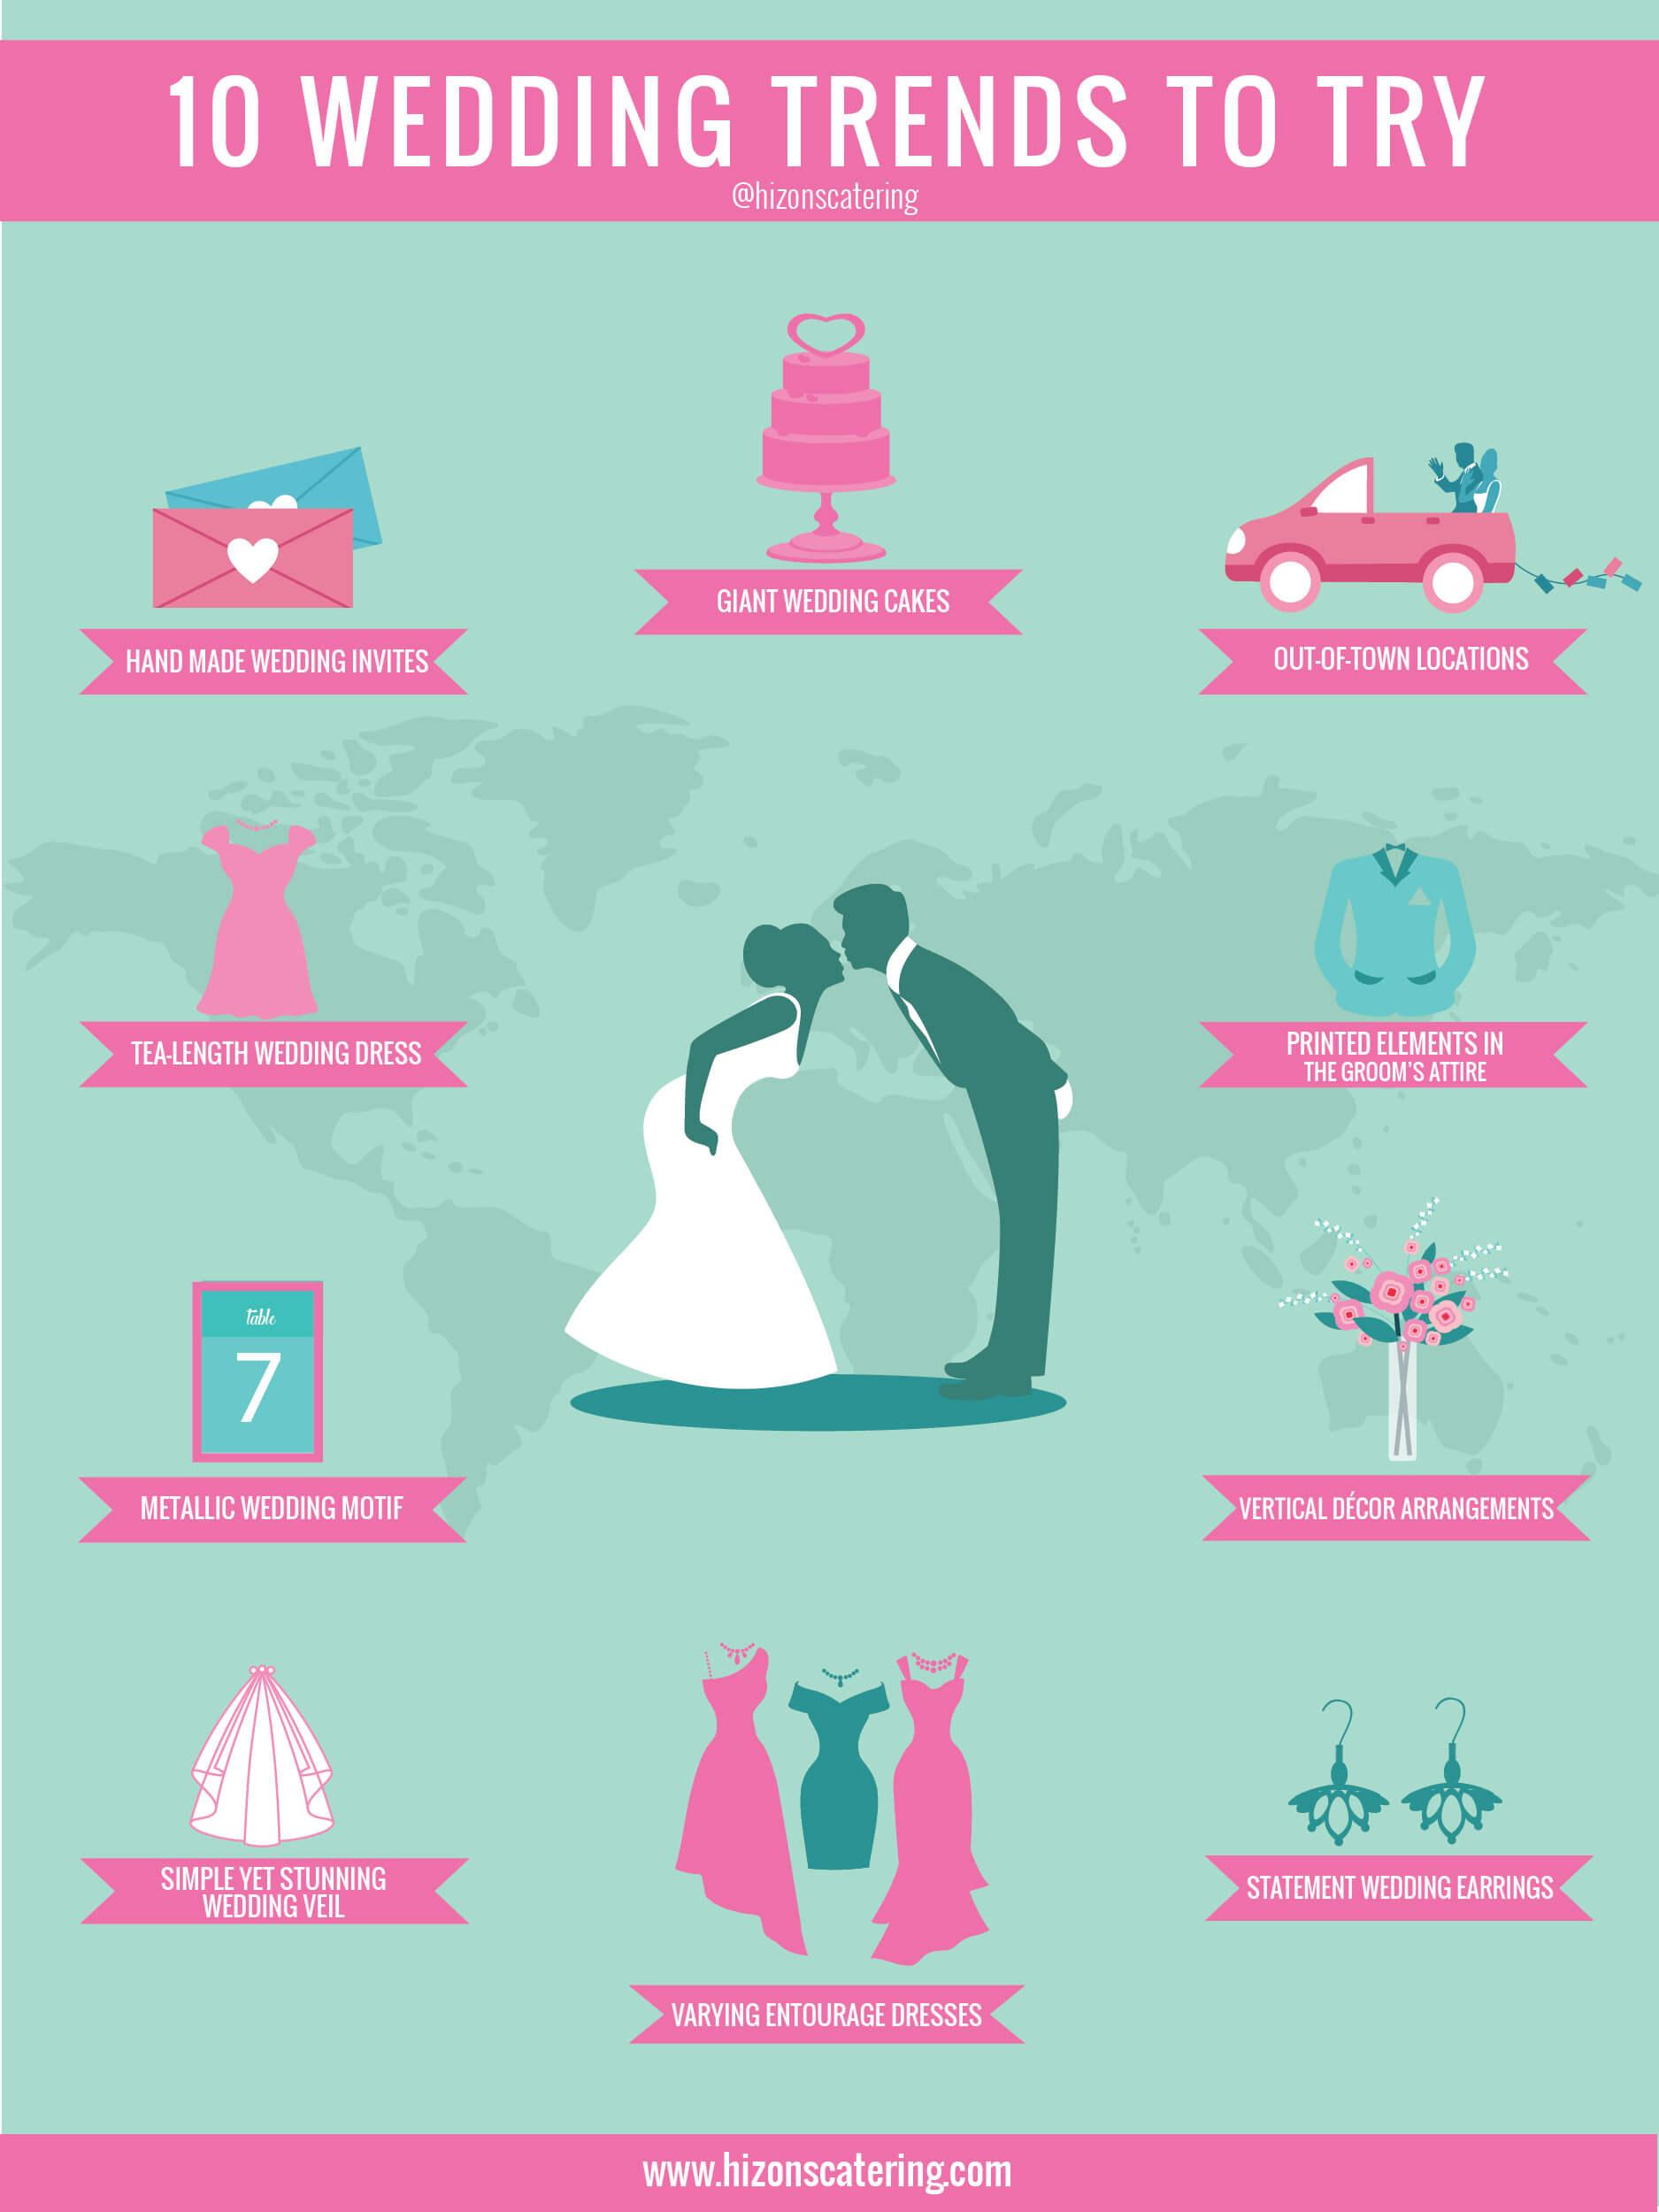 hizons catering wedding trends 2017